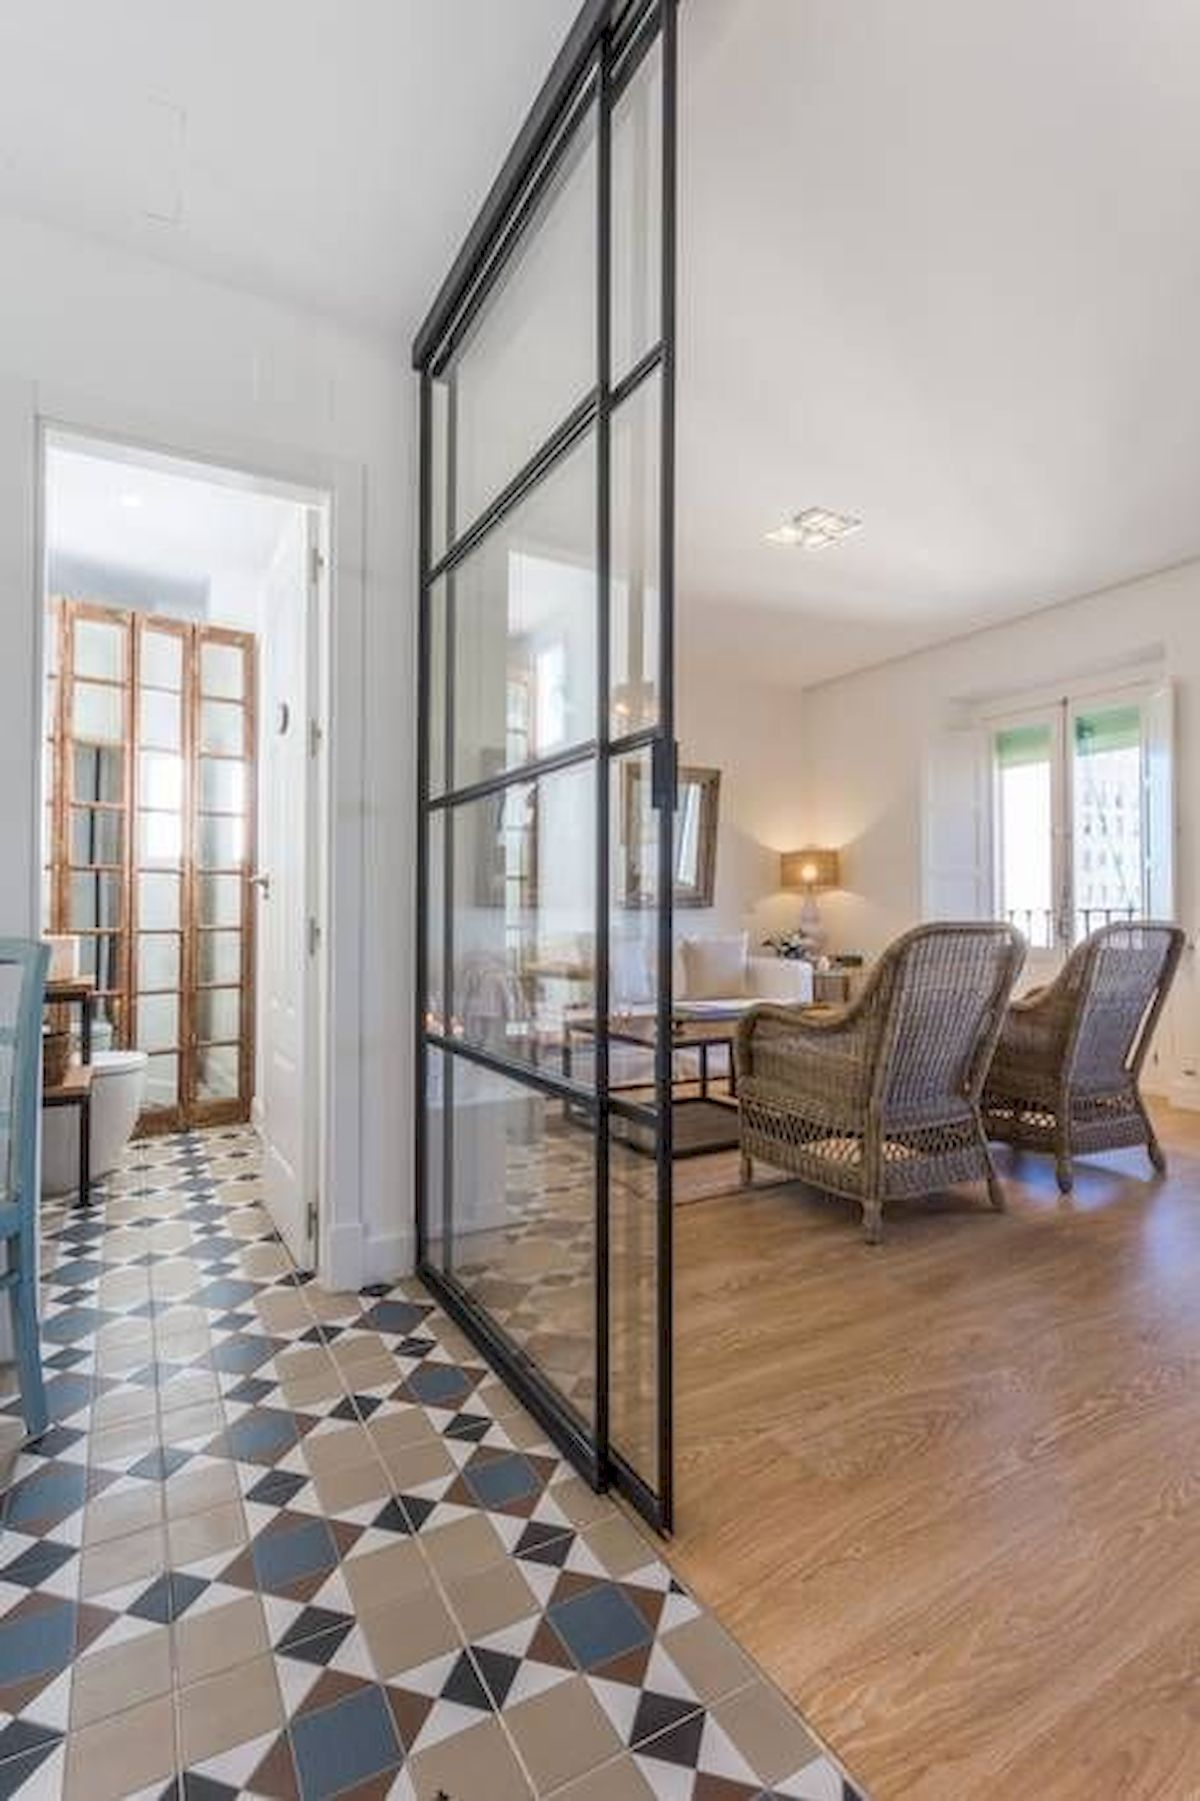 40 Best Tile Flooring Designs Ideas For Modern Kitchen (15)